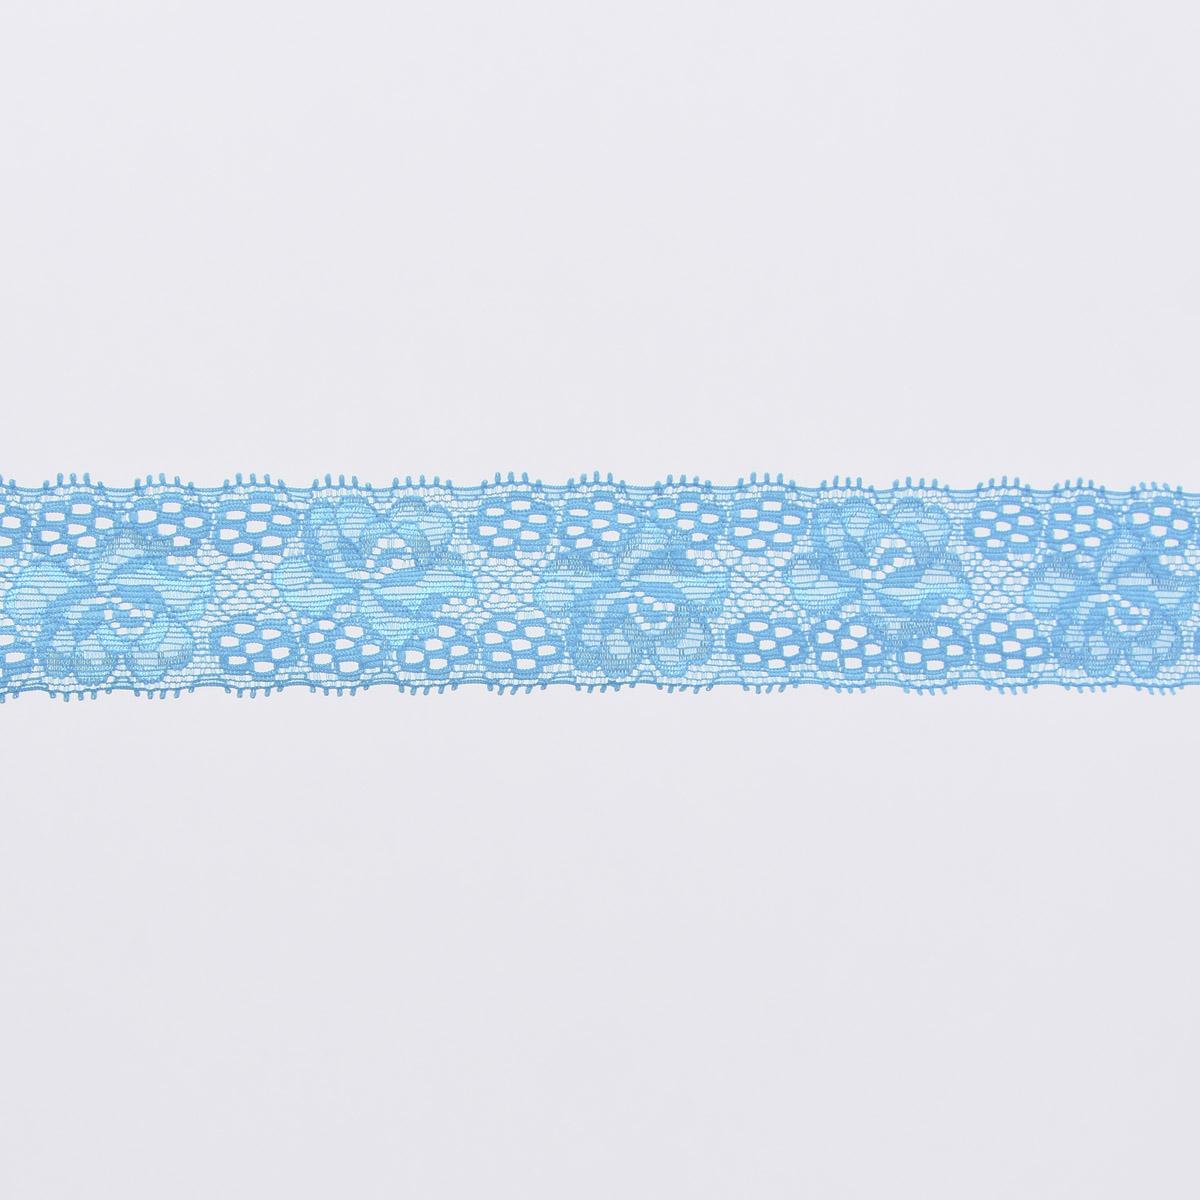 Spitze elastisch Blumen Meterware türkis Breite: 3cm